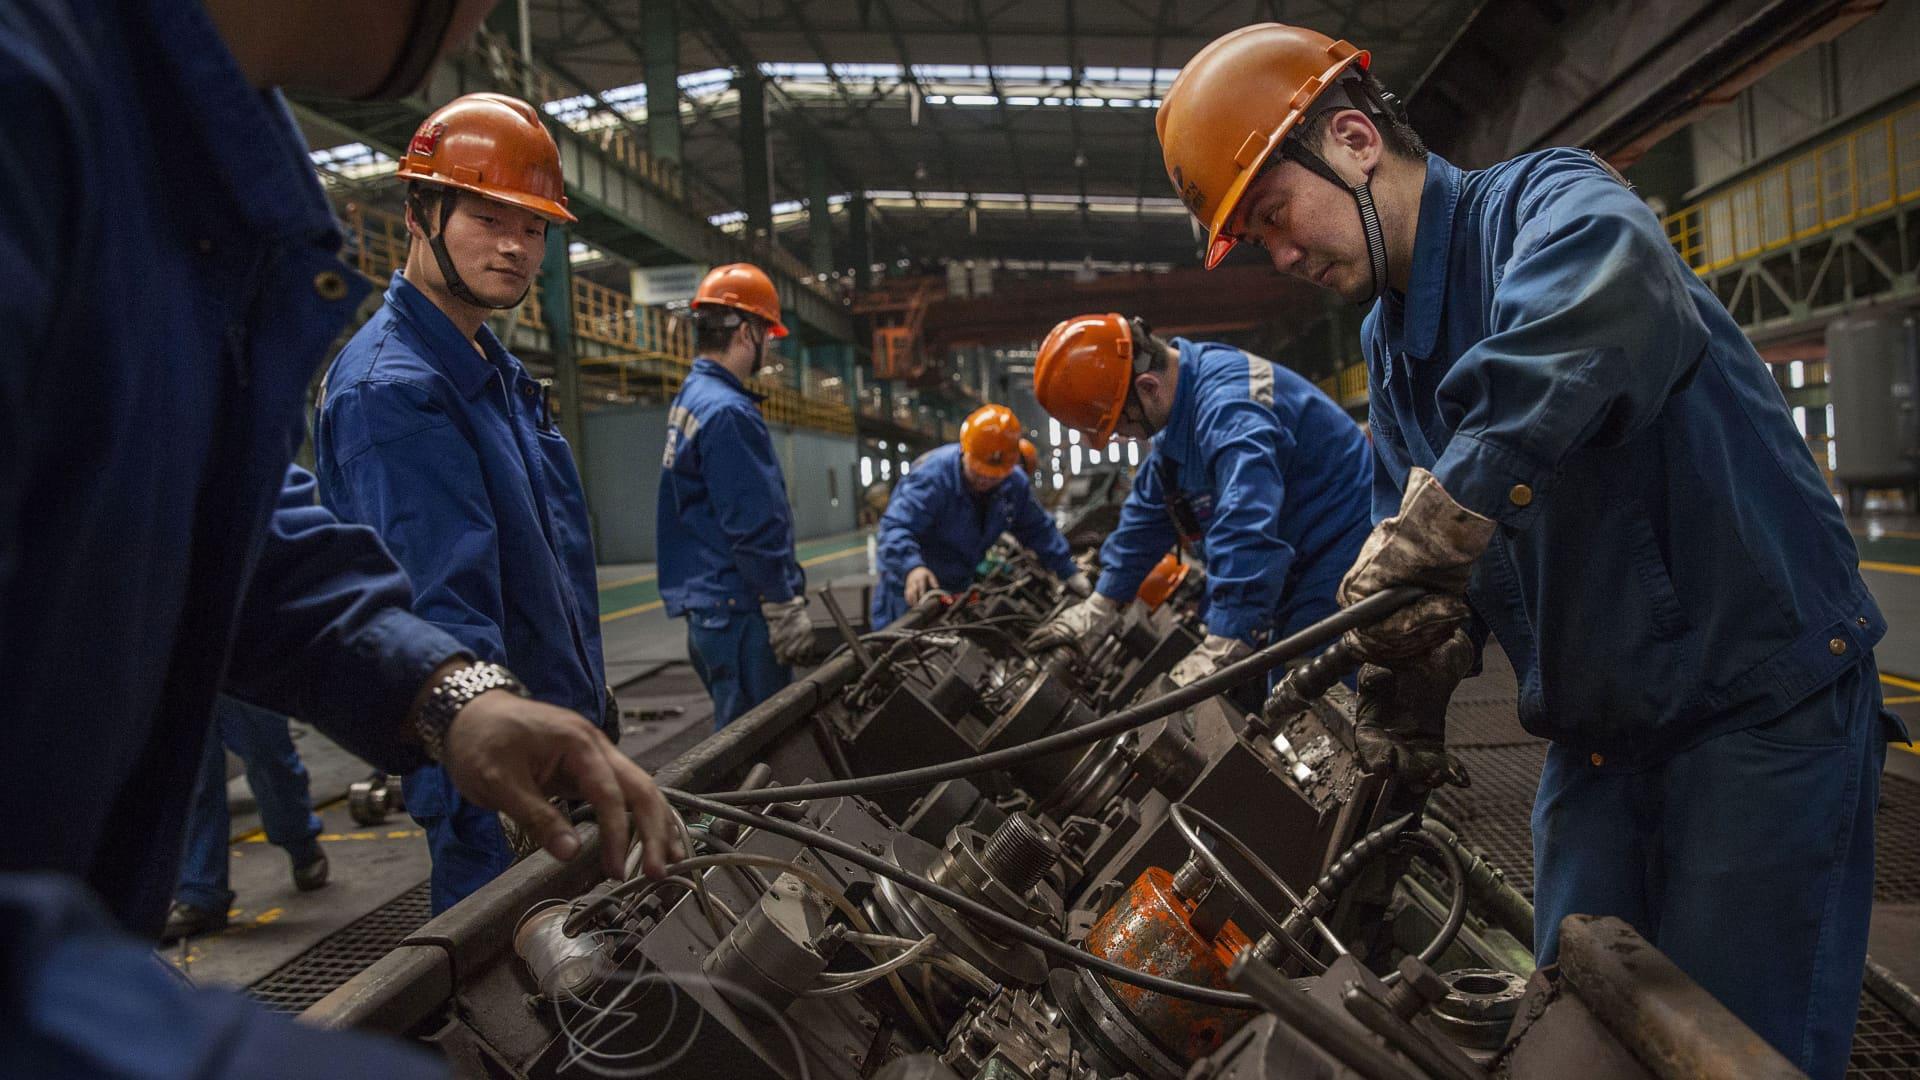 Workers at the Zhong Tian (Zenith) Steel Group Corporation in Changzhou, China's Jiangsu province on May 12, 2016.